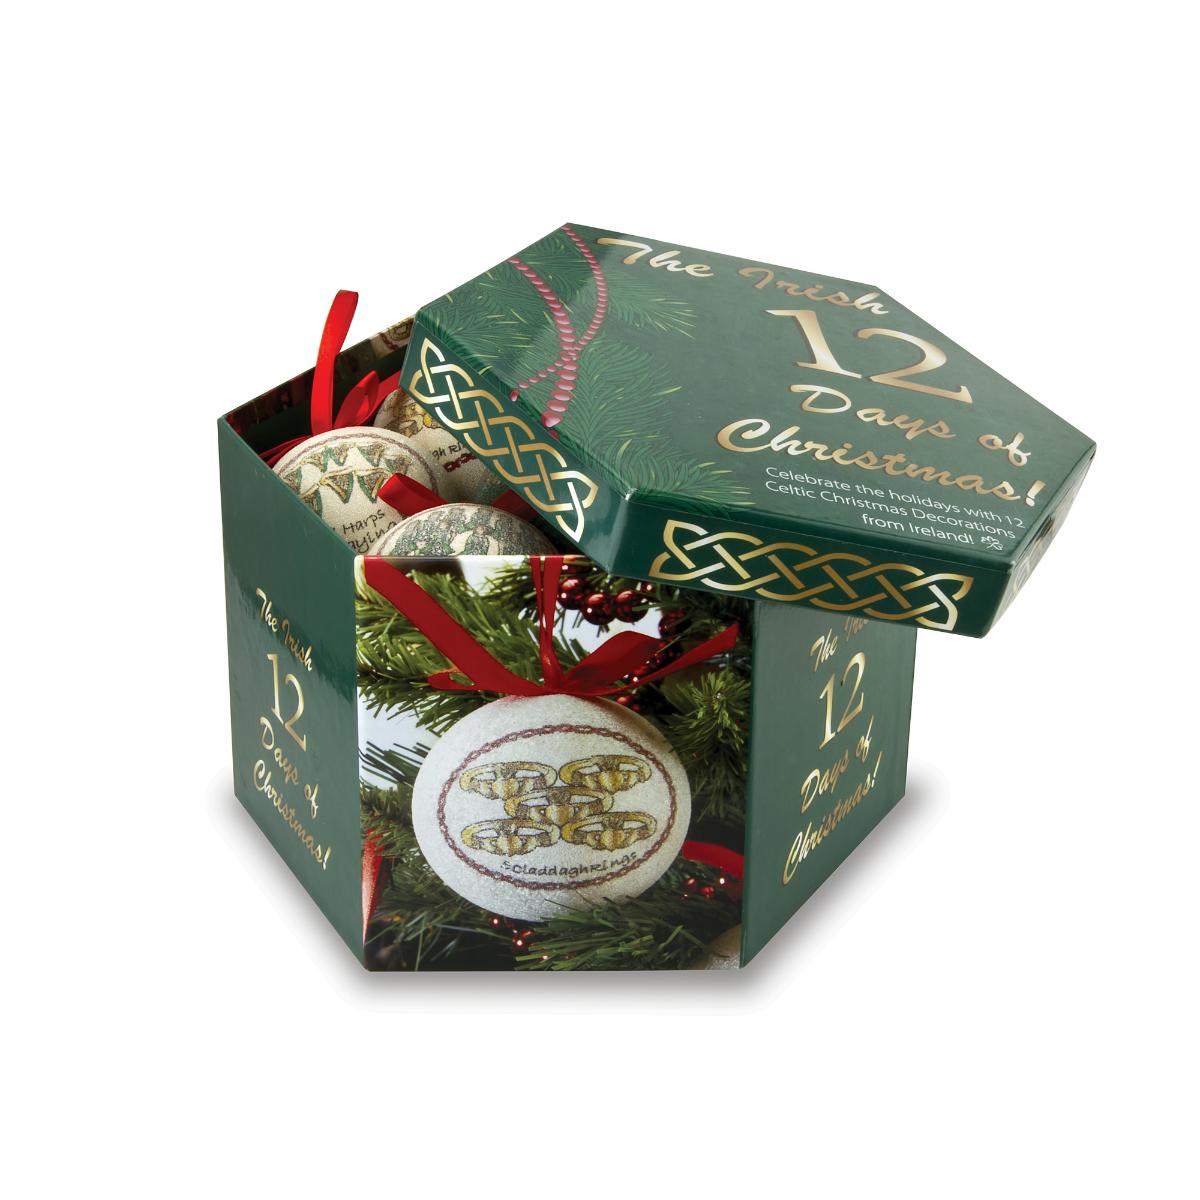 Days of christmas ornament set keepsake box irish